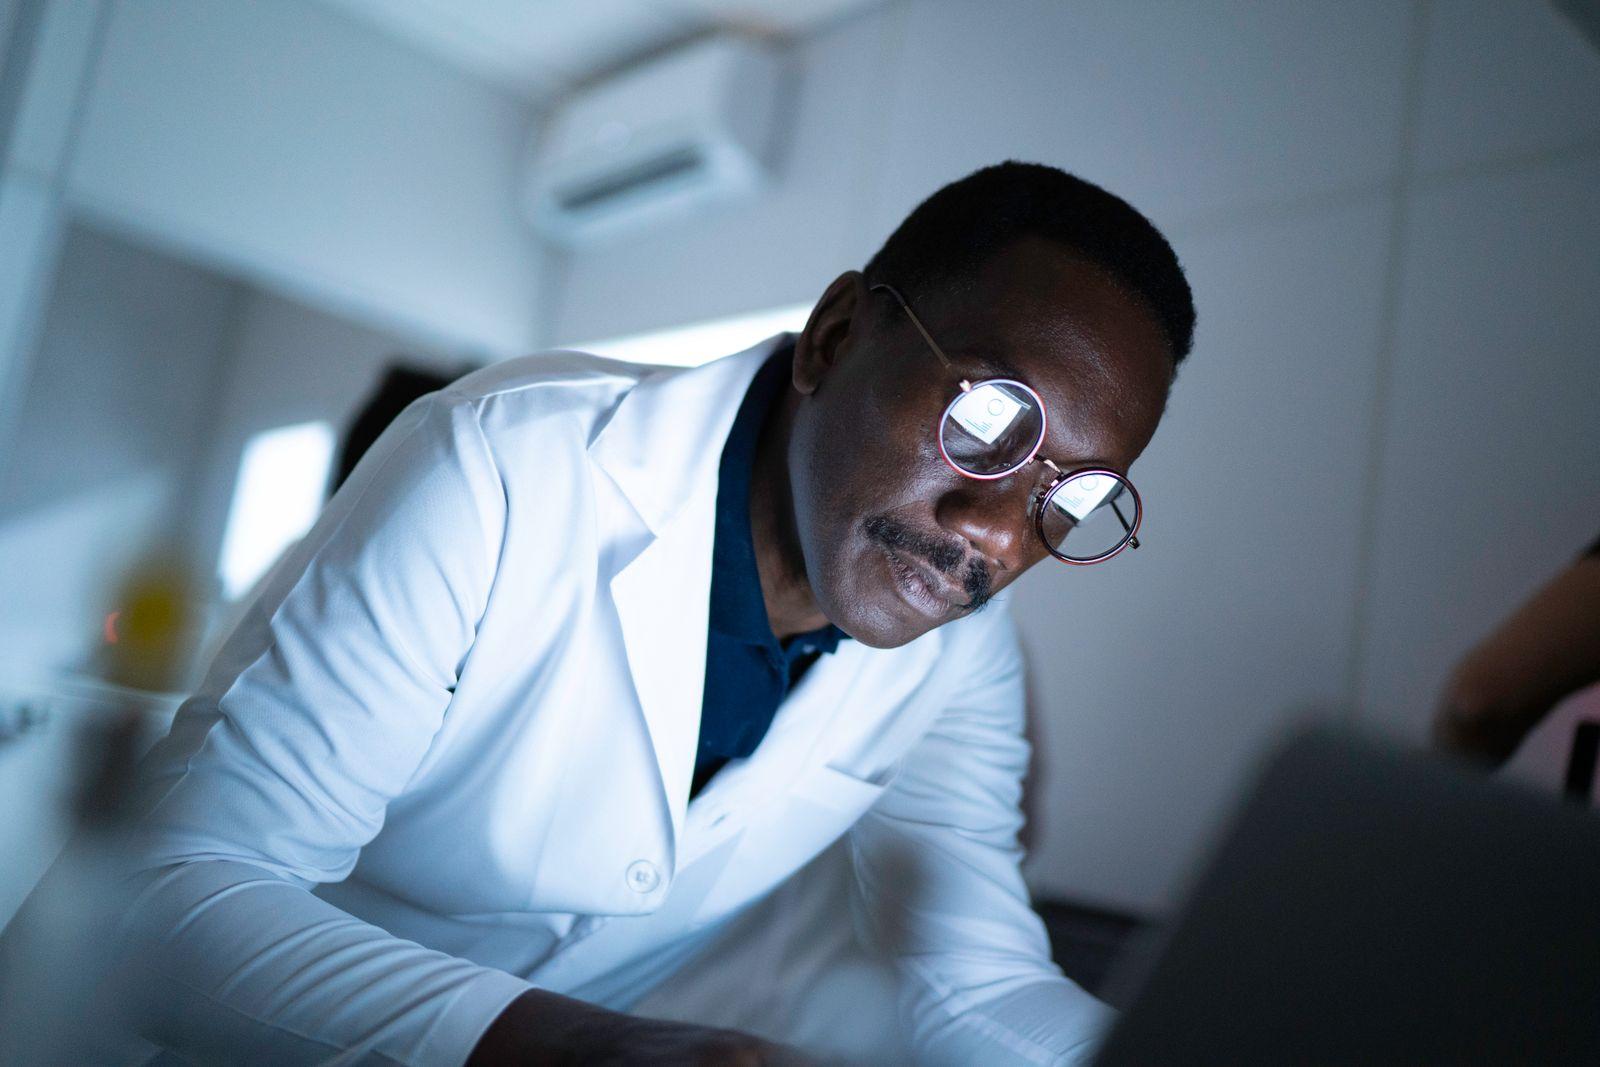 Scientist using computer in laboratory